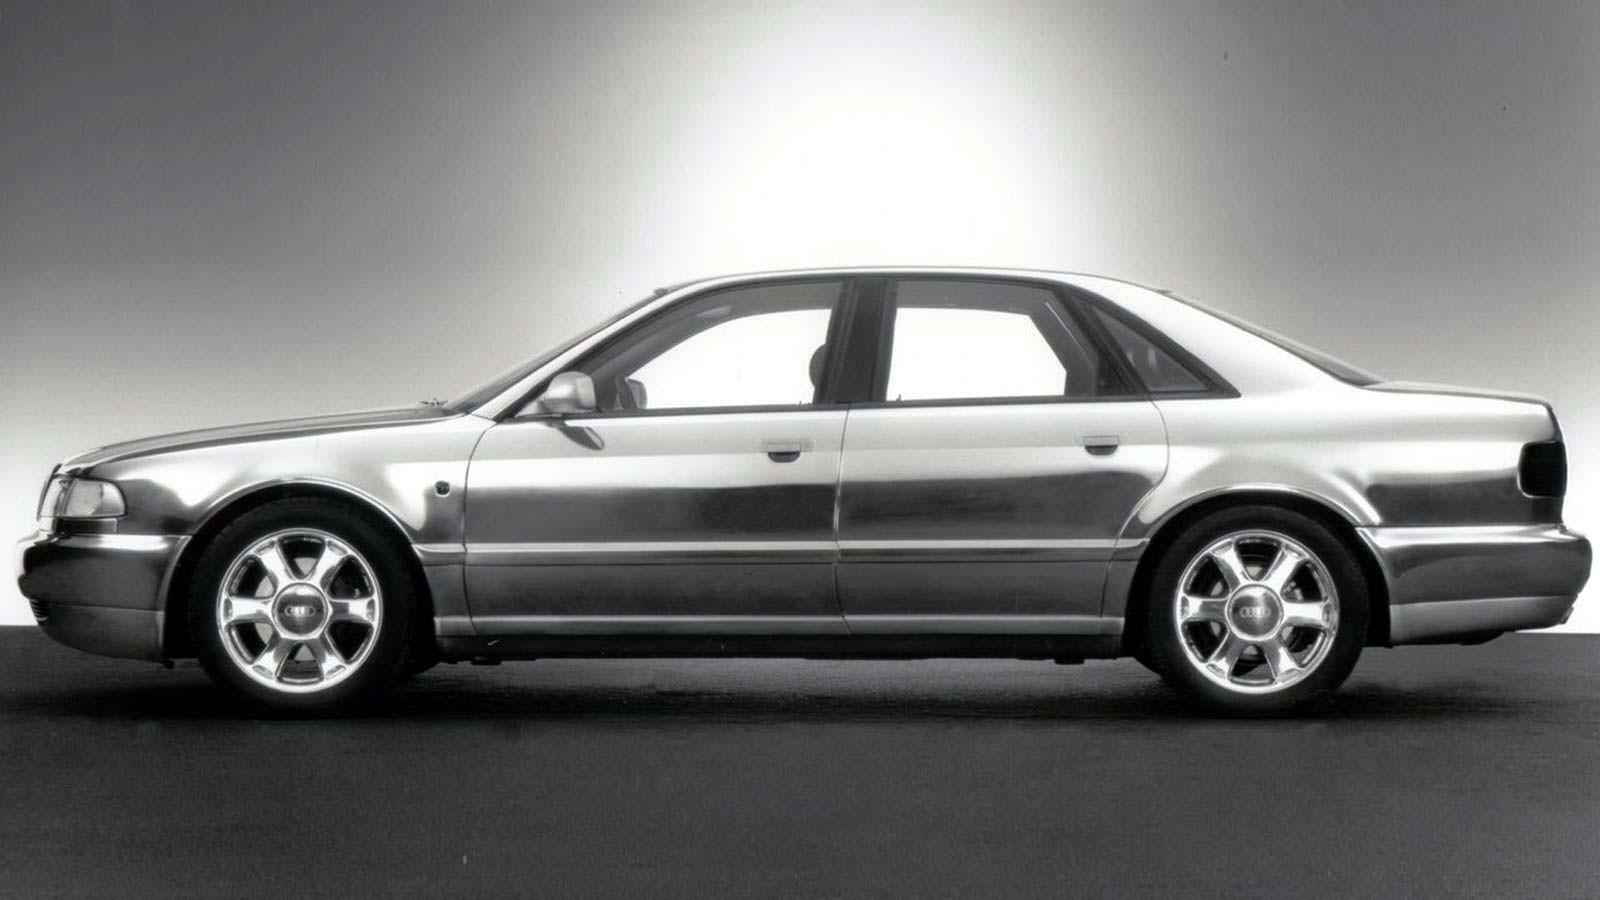 1993 Audi Space Frame. Концепт в алюминиевом кузове